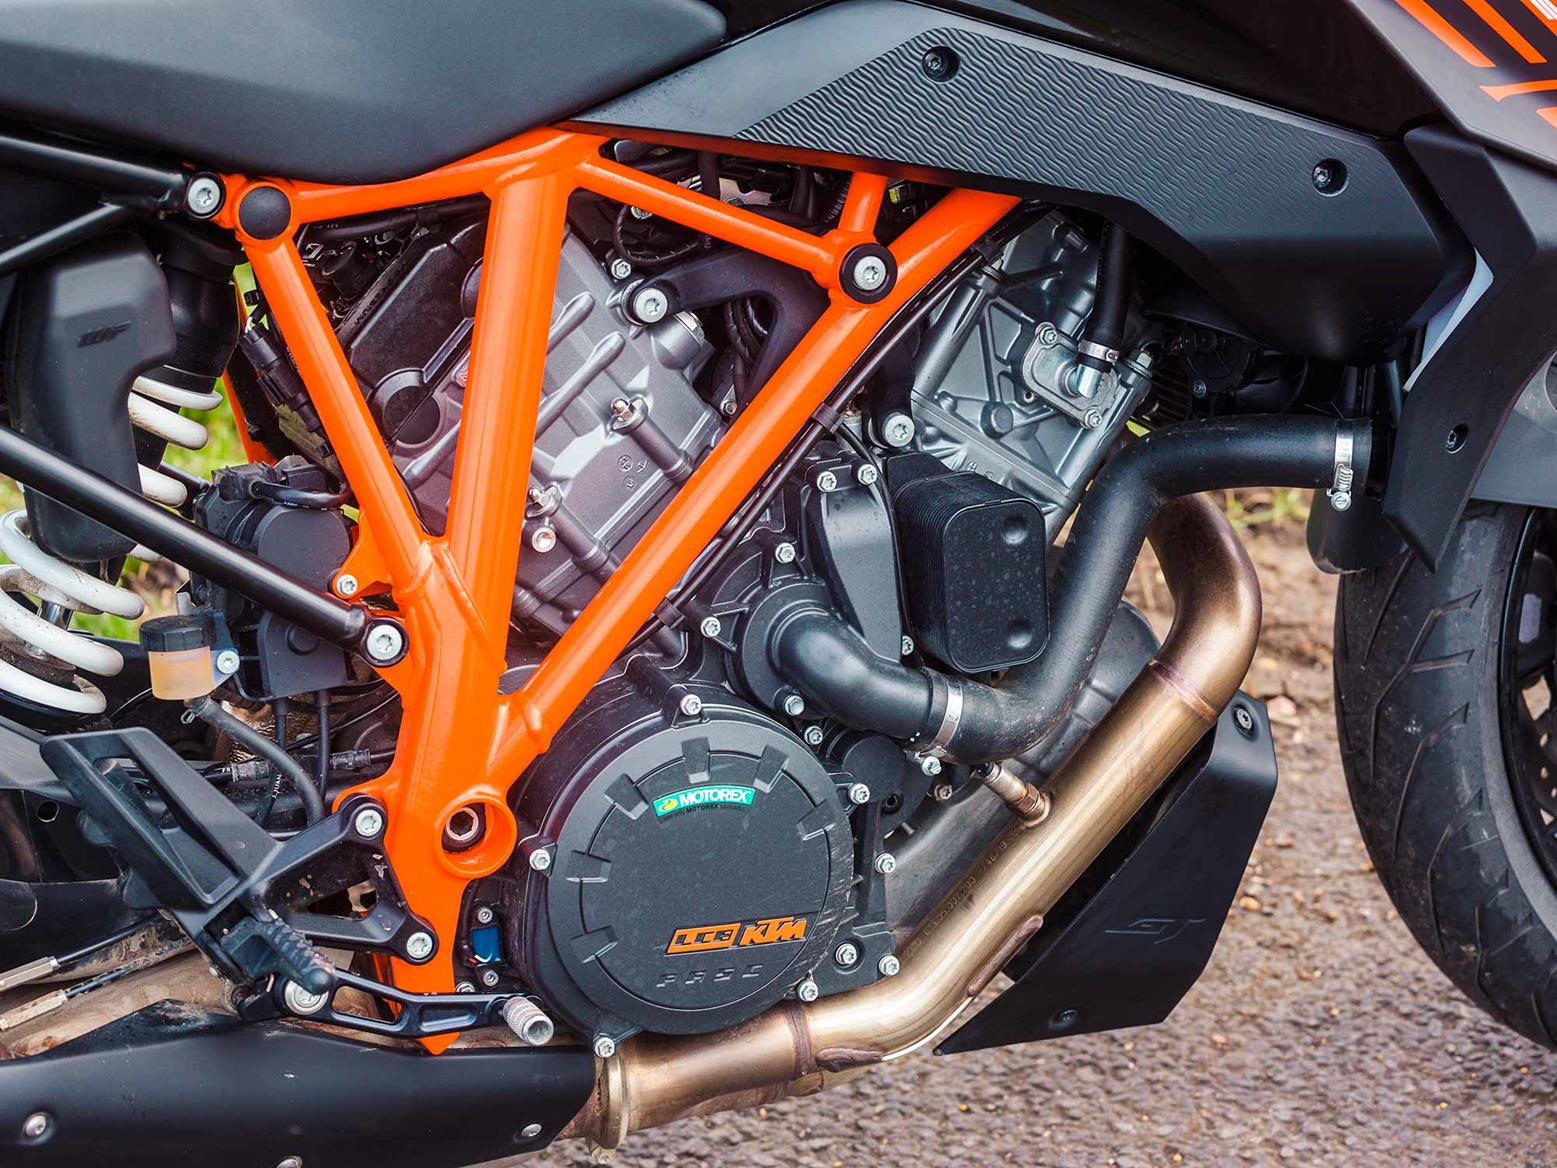 KTM 1290 Super Duke GT engine